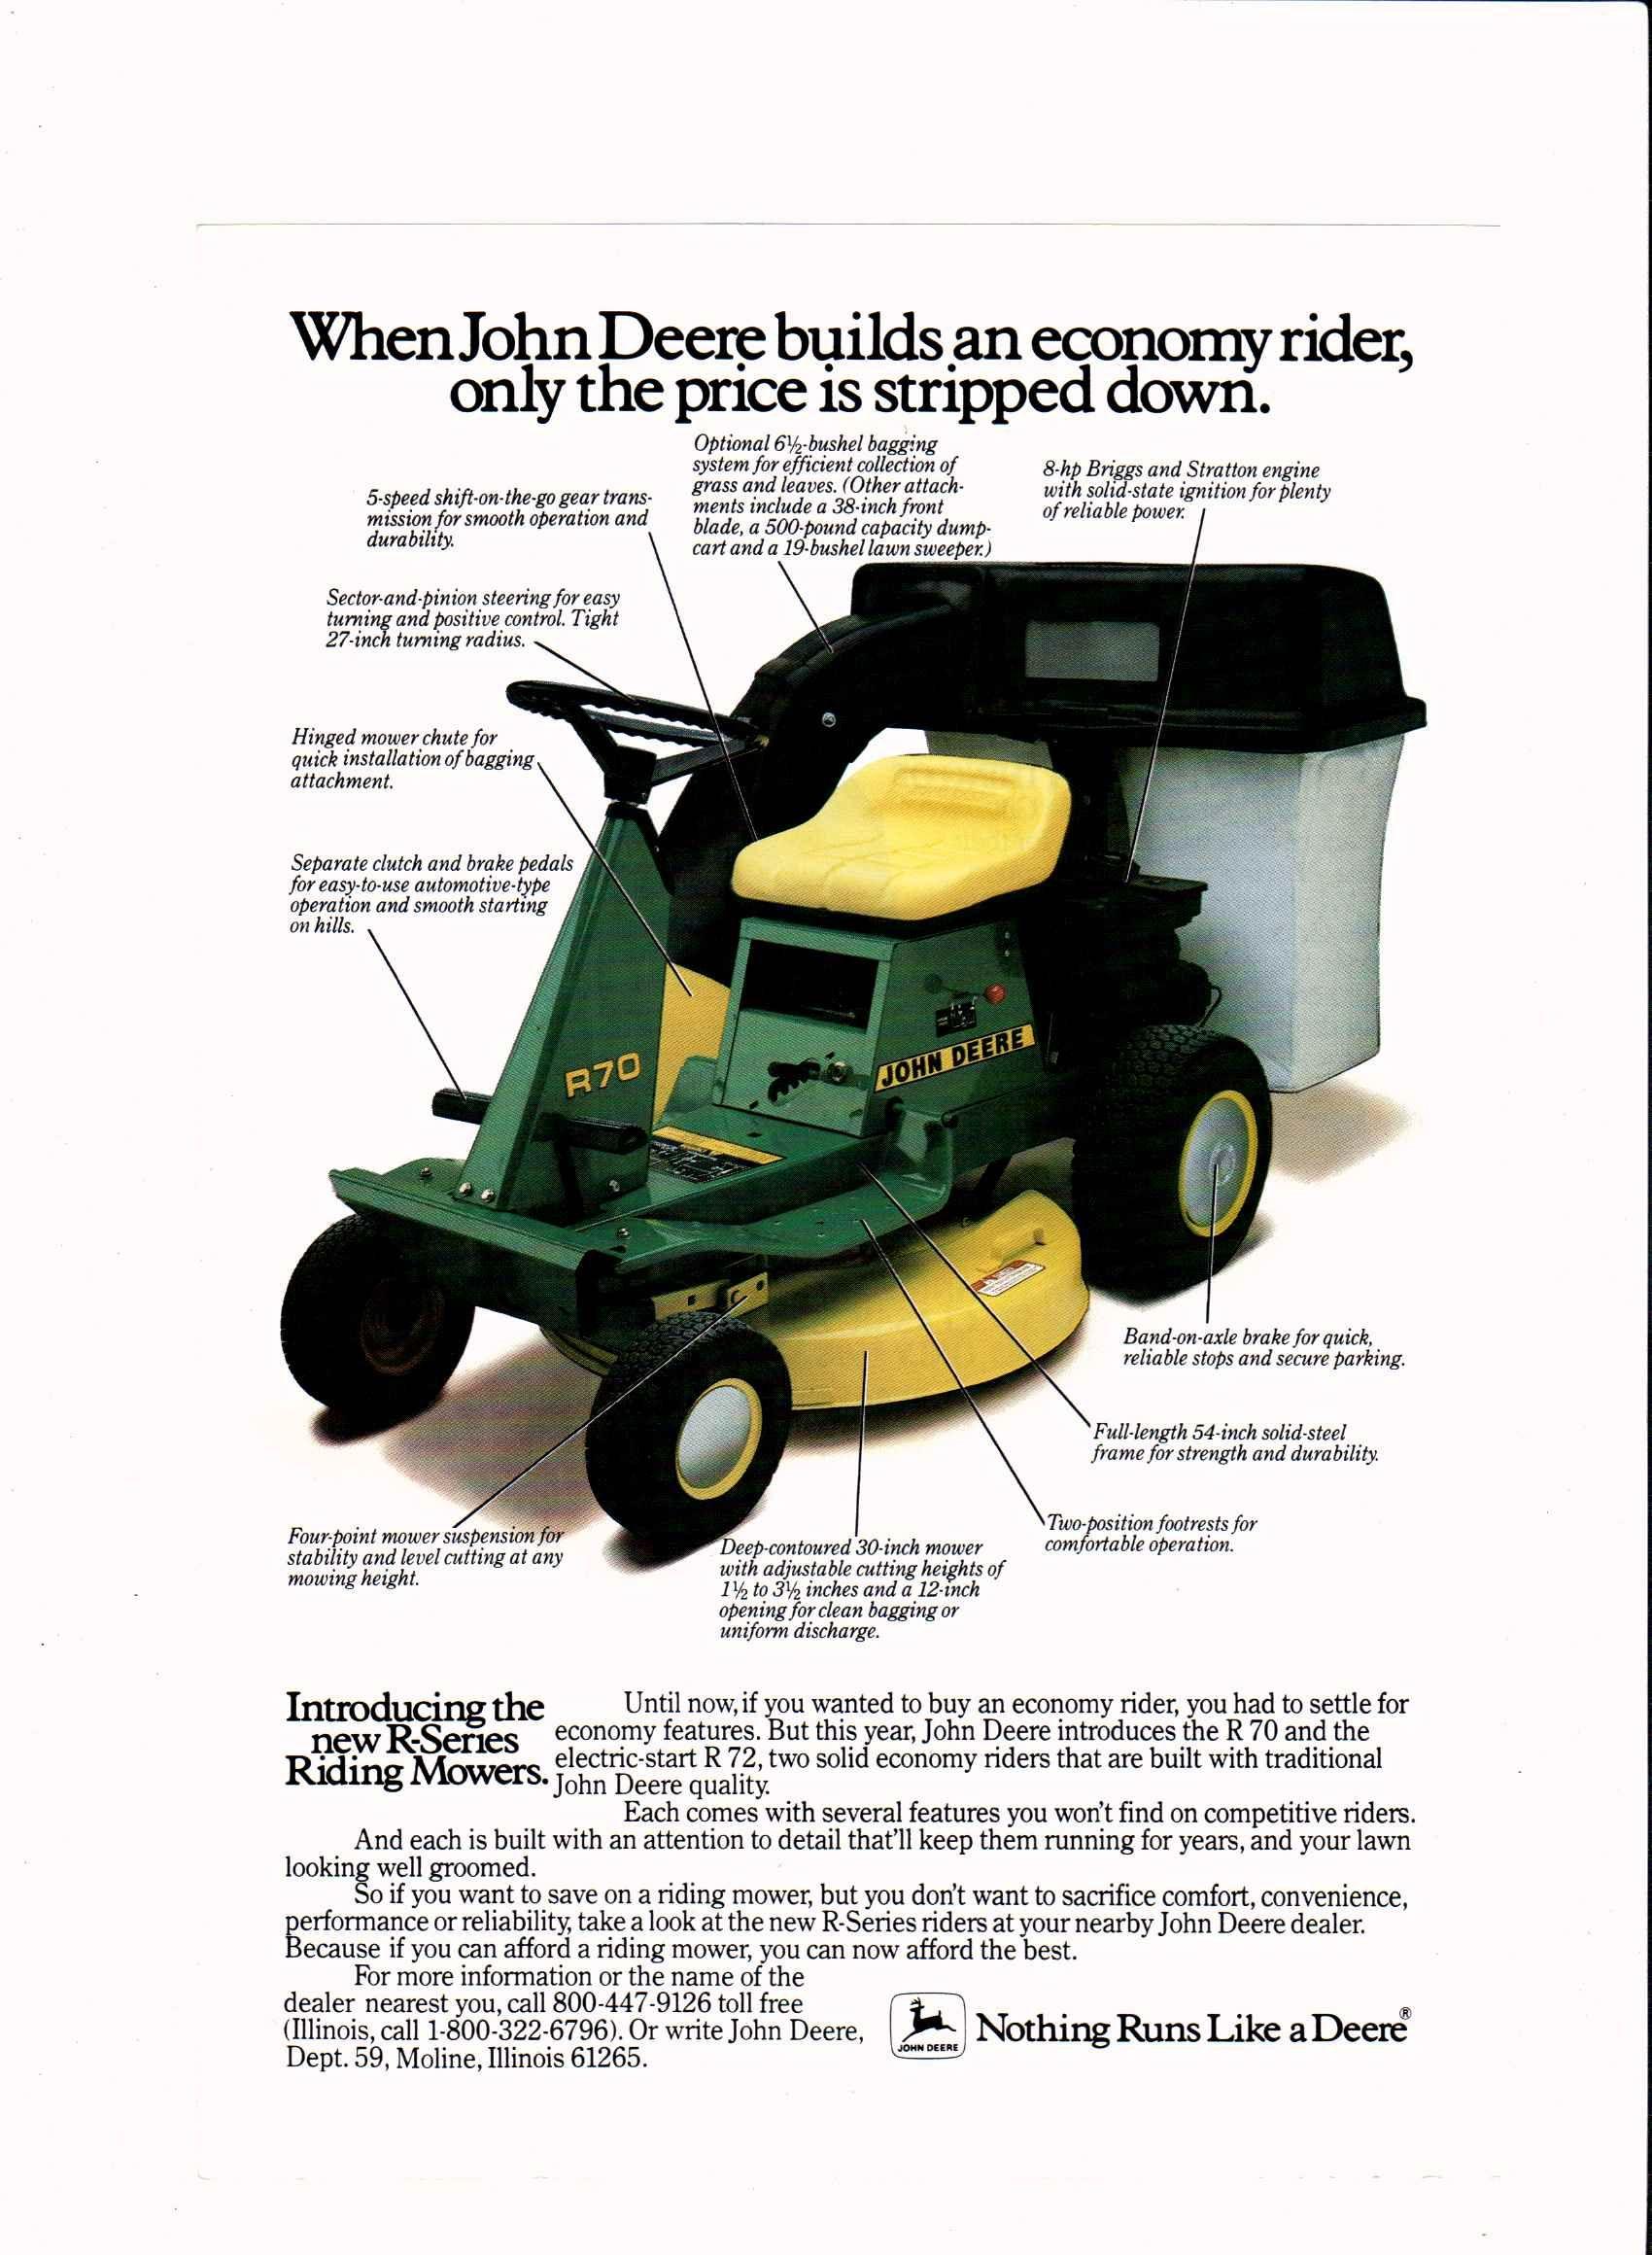 1984 John Deere R70 R Series Riding Mowers